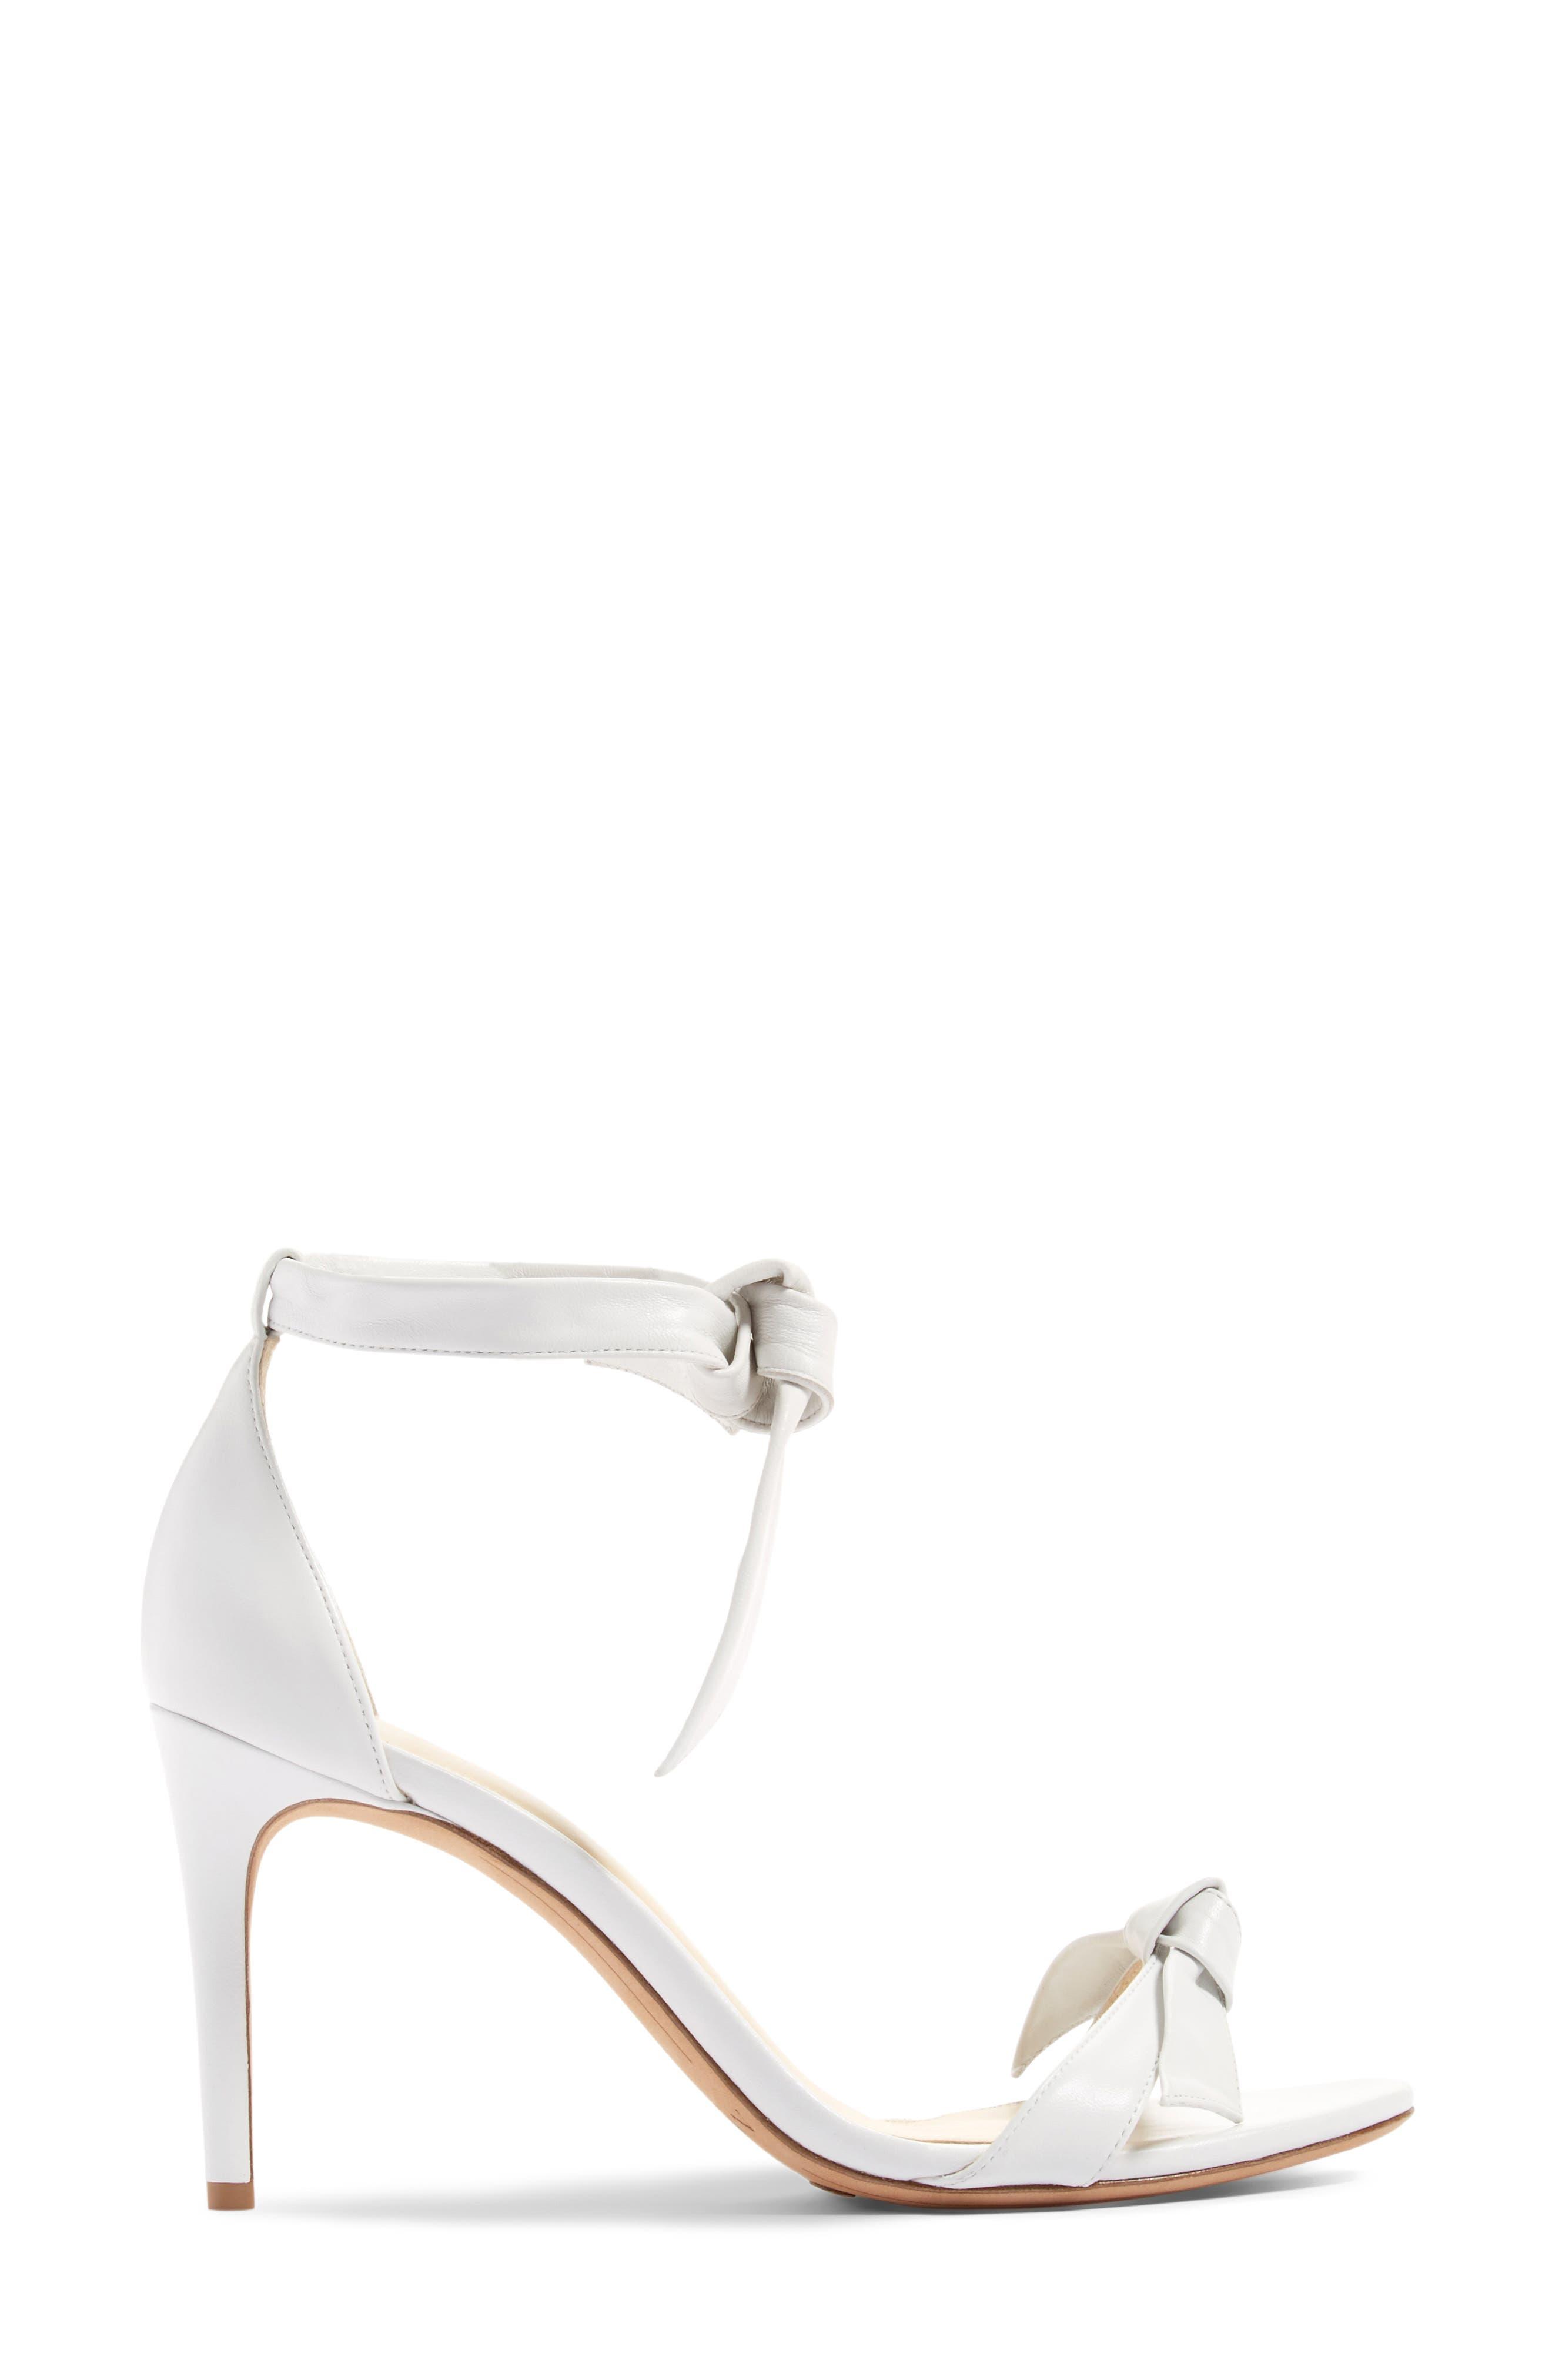 Clarita Ankle Tie Sandal,                             Alternate thumbnail 2, color,